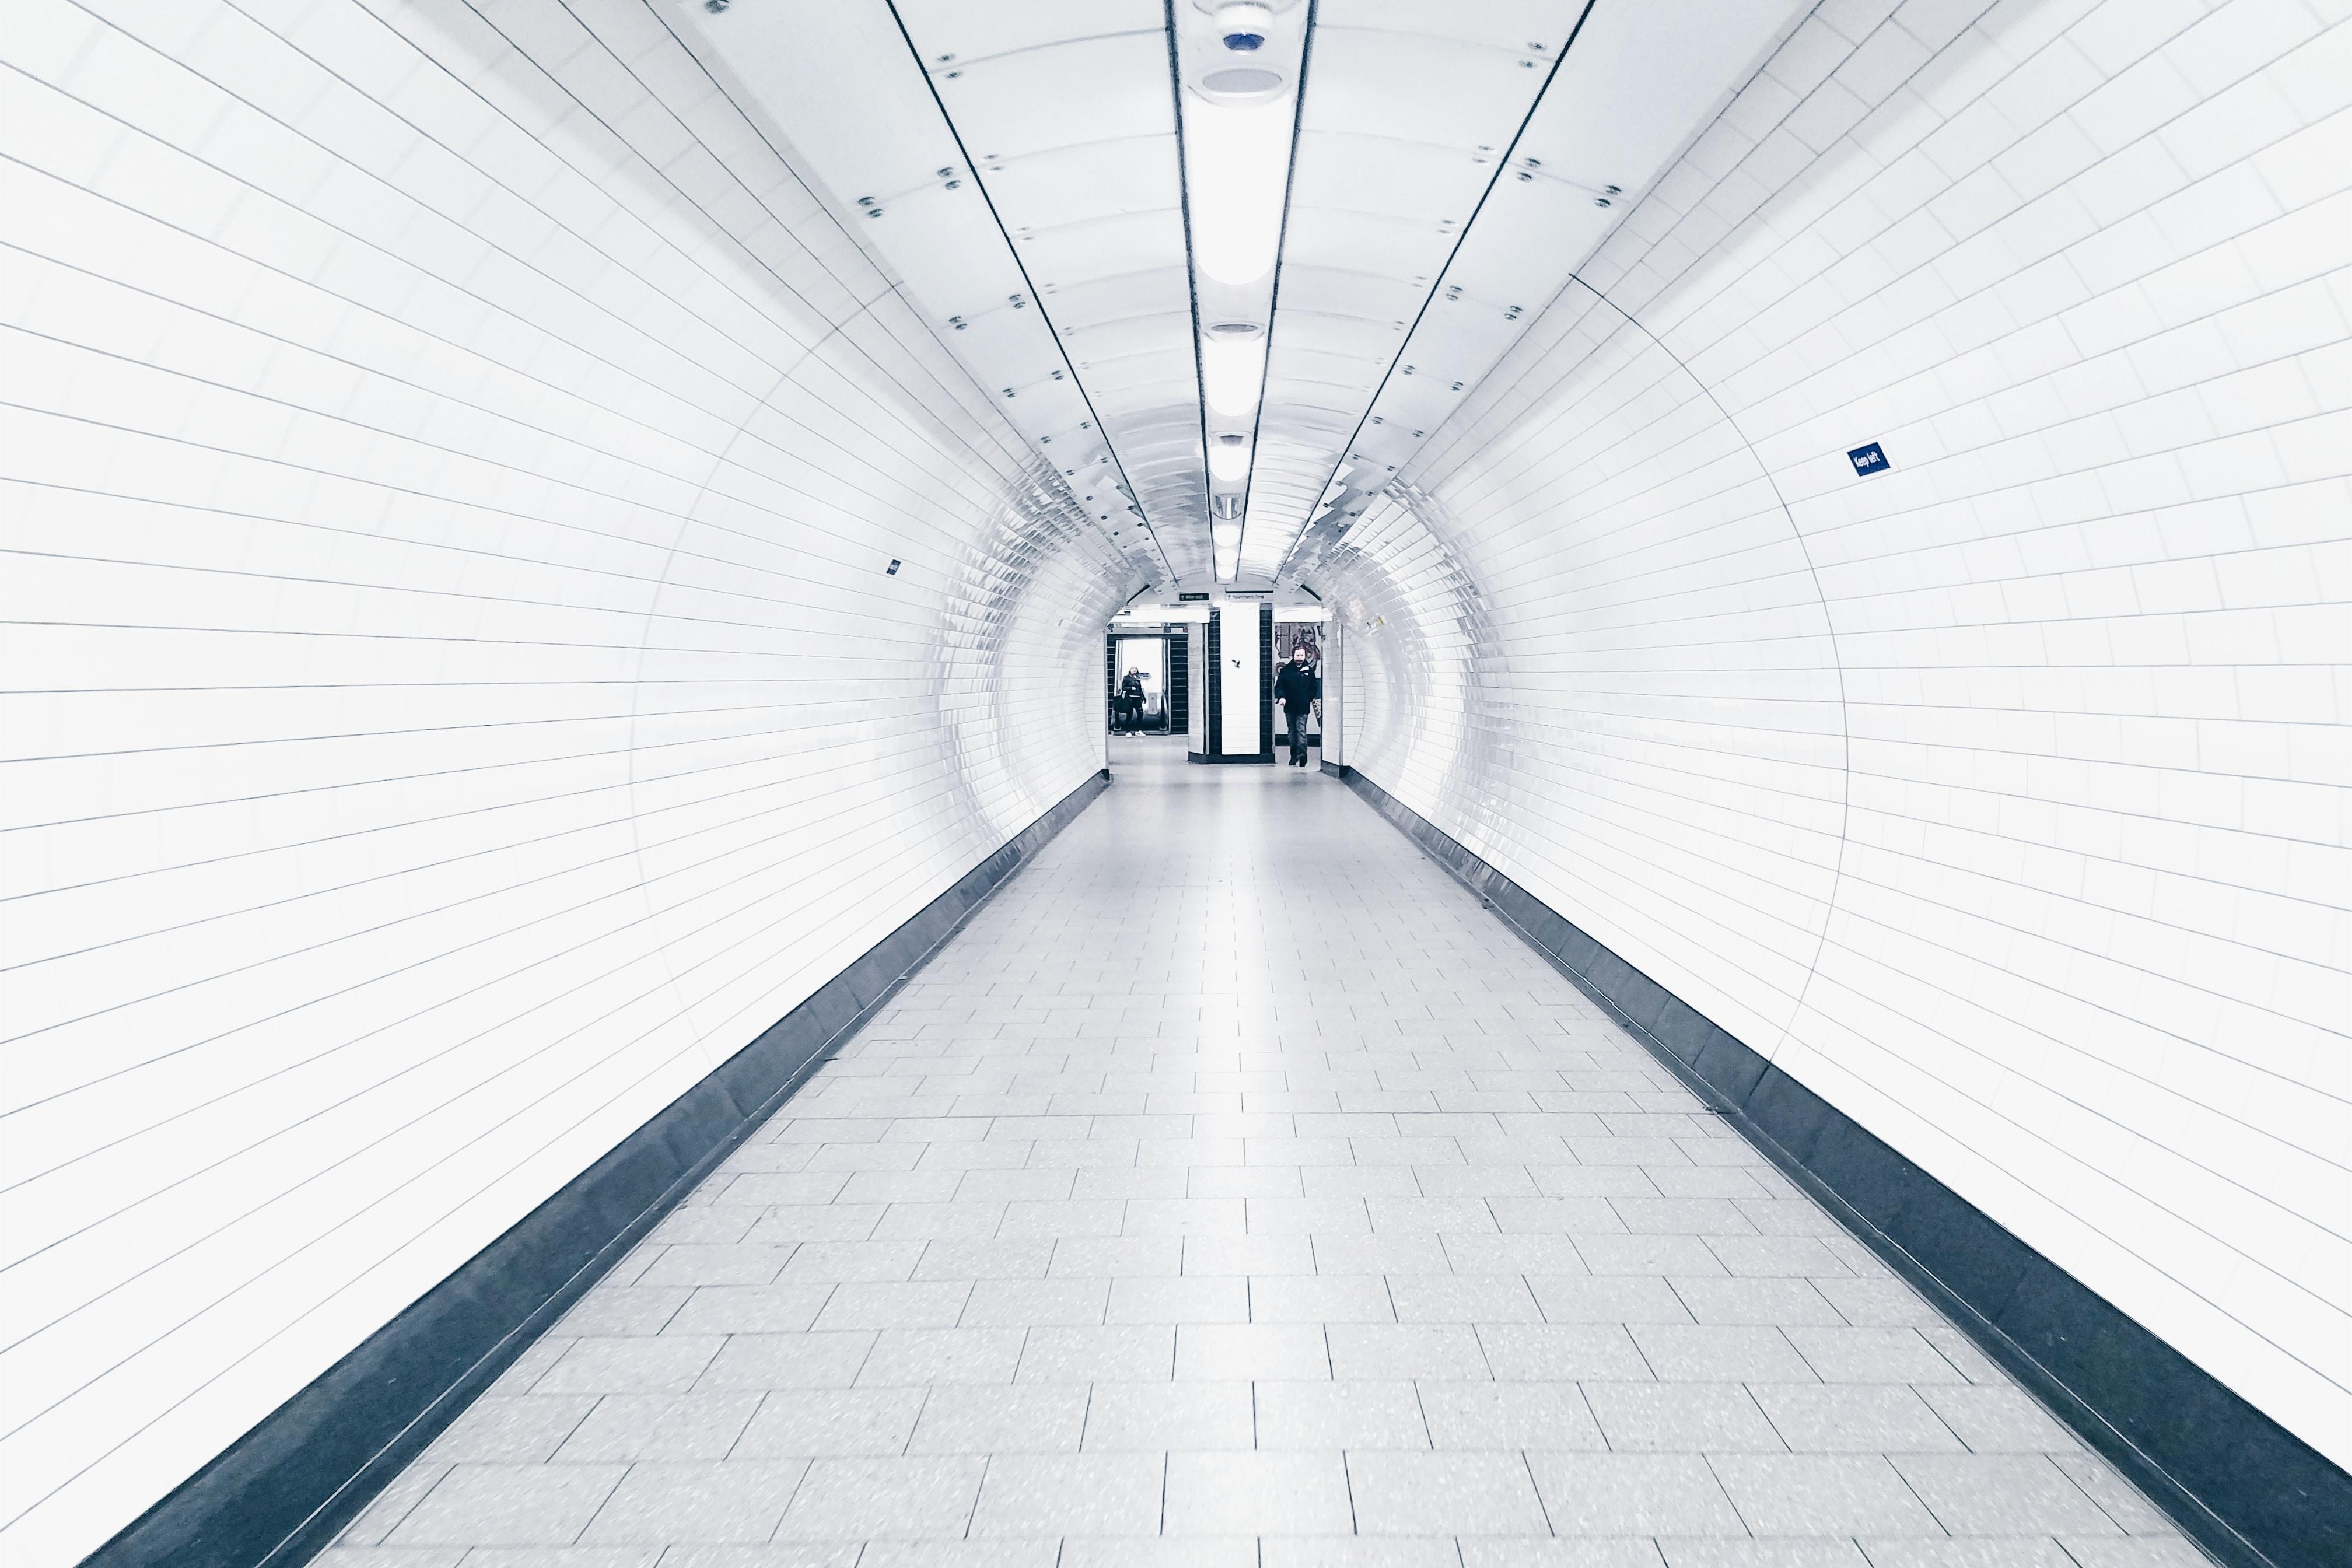 white painted hallway